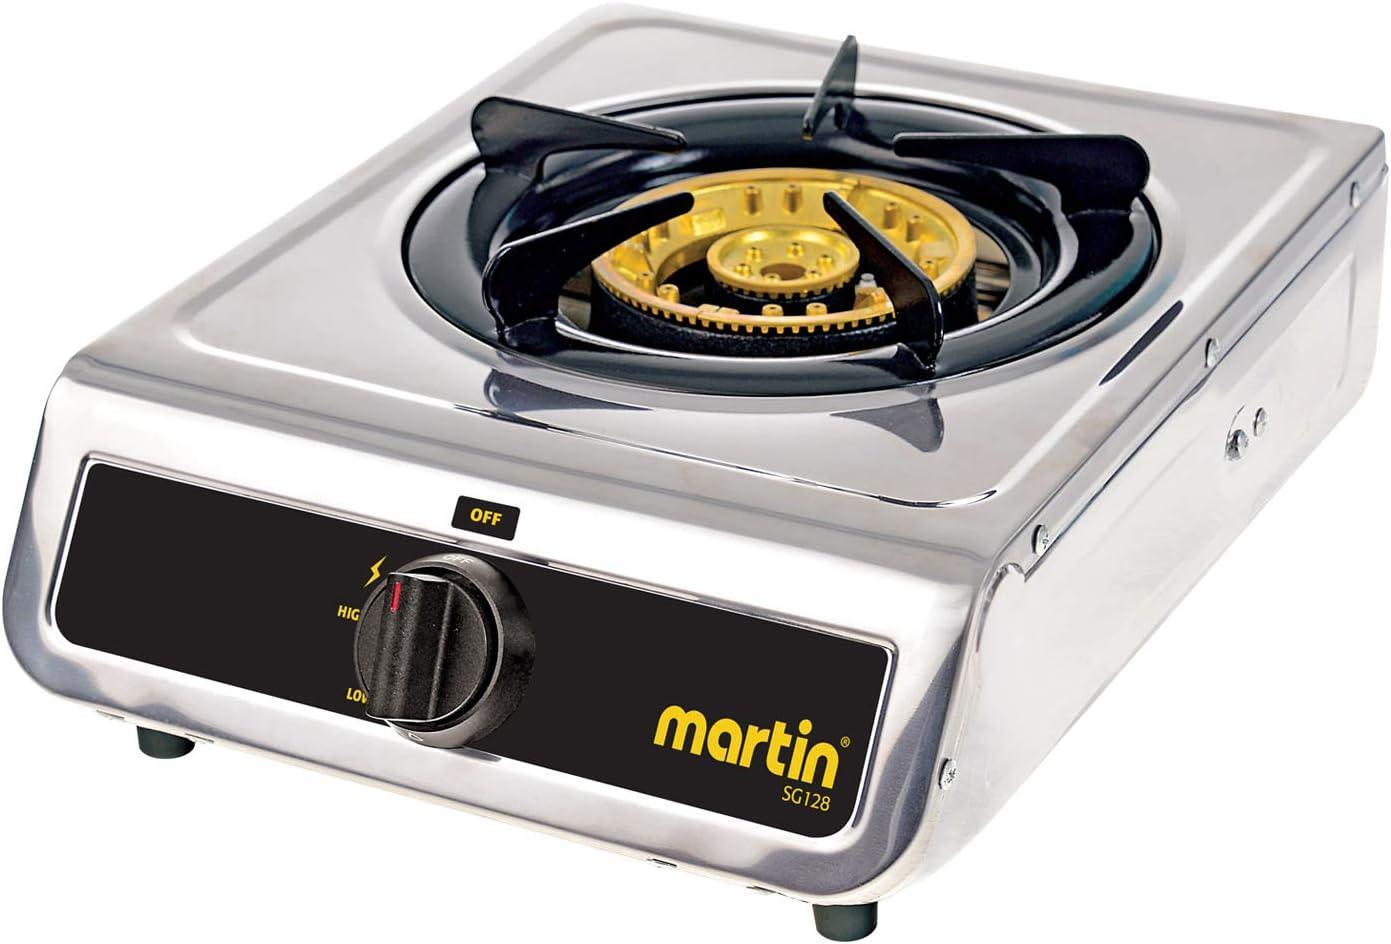 Martin SG-128 Propane Hot Plate Cooking Stove Cooktop 12,800 BTU Powered Brass Burner with Pressure Regulator